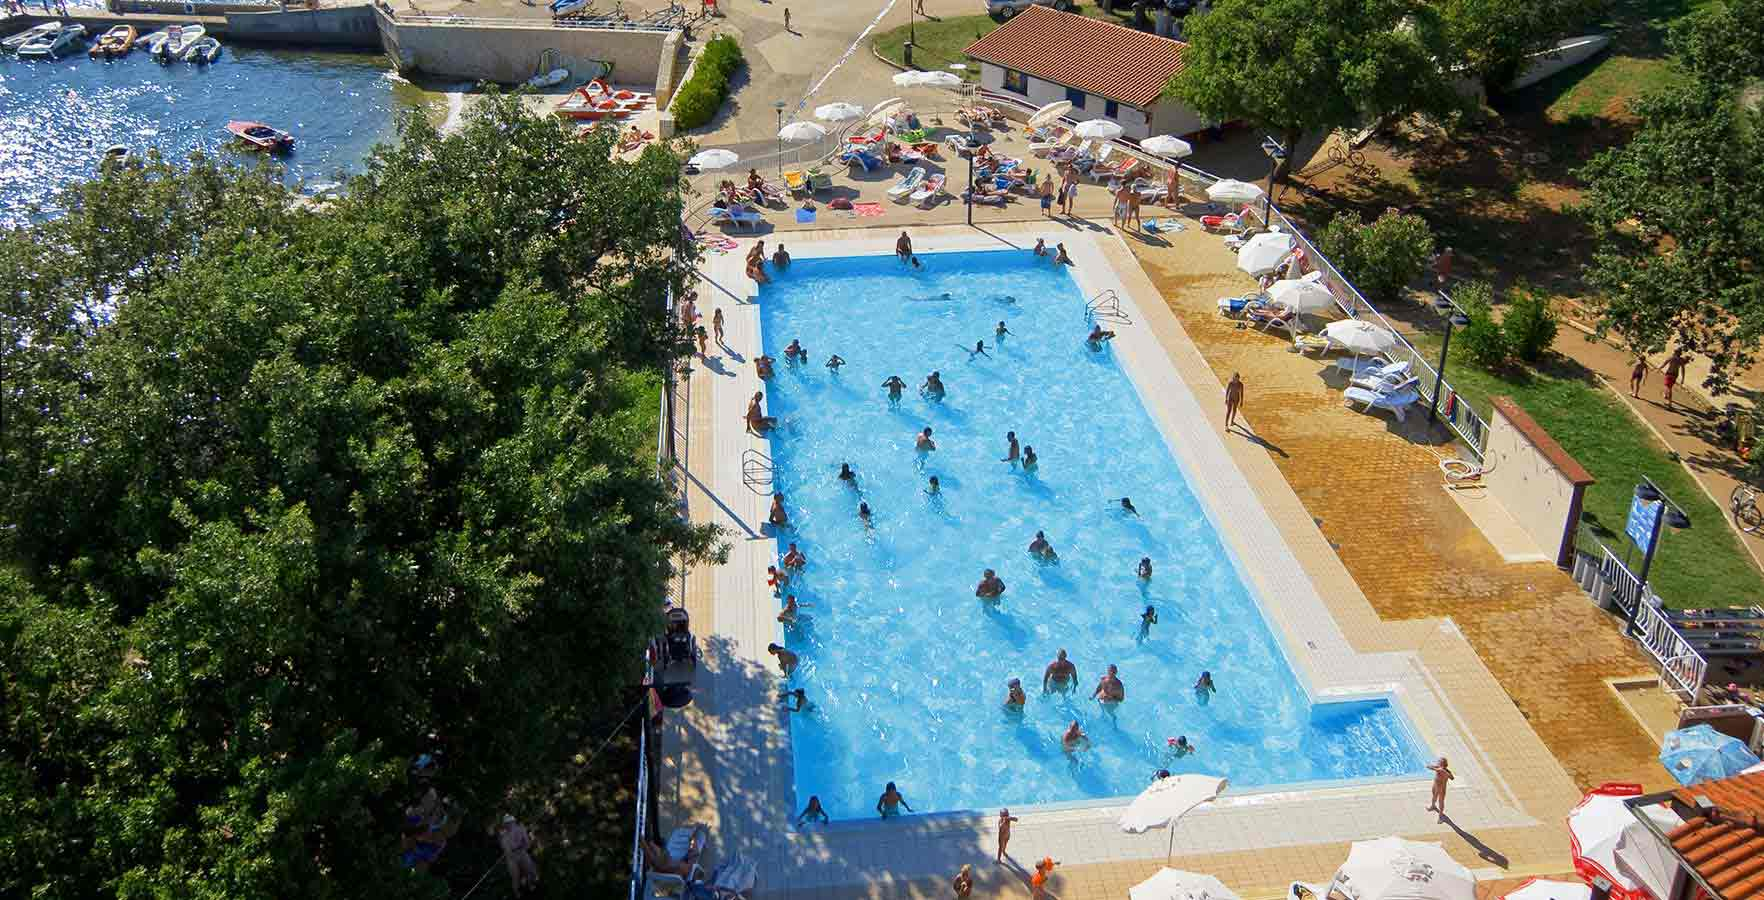 https://www.camping.hr/cmsmedia/katalog/113/180-camp-solaris-swimming-pool.jpg